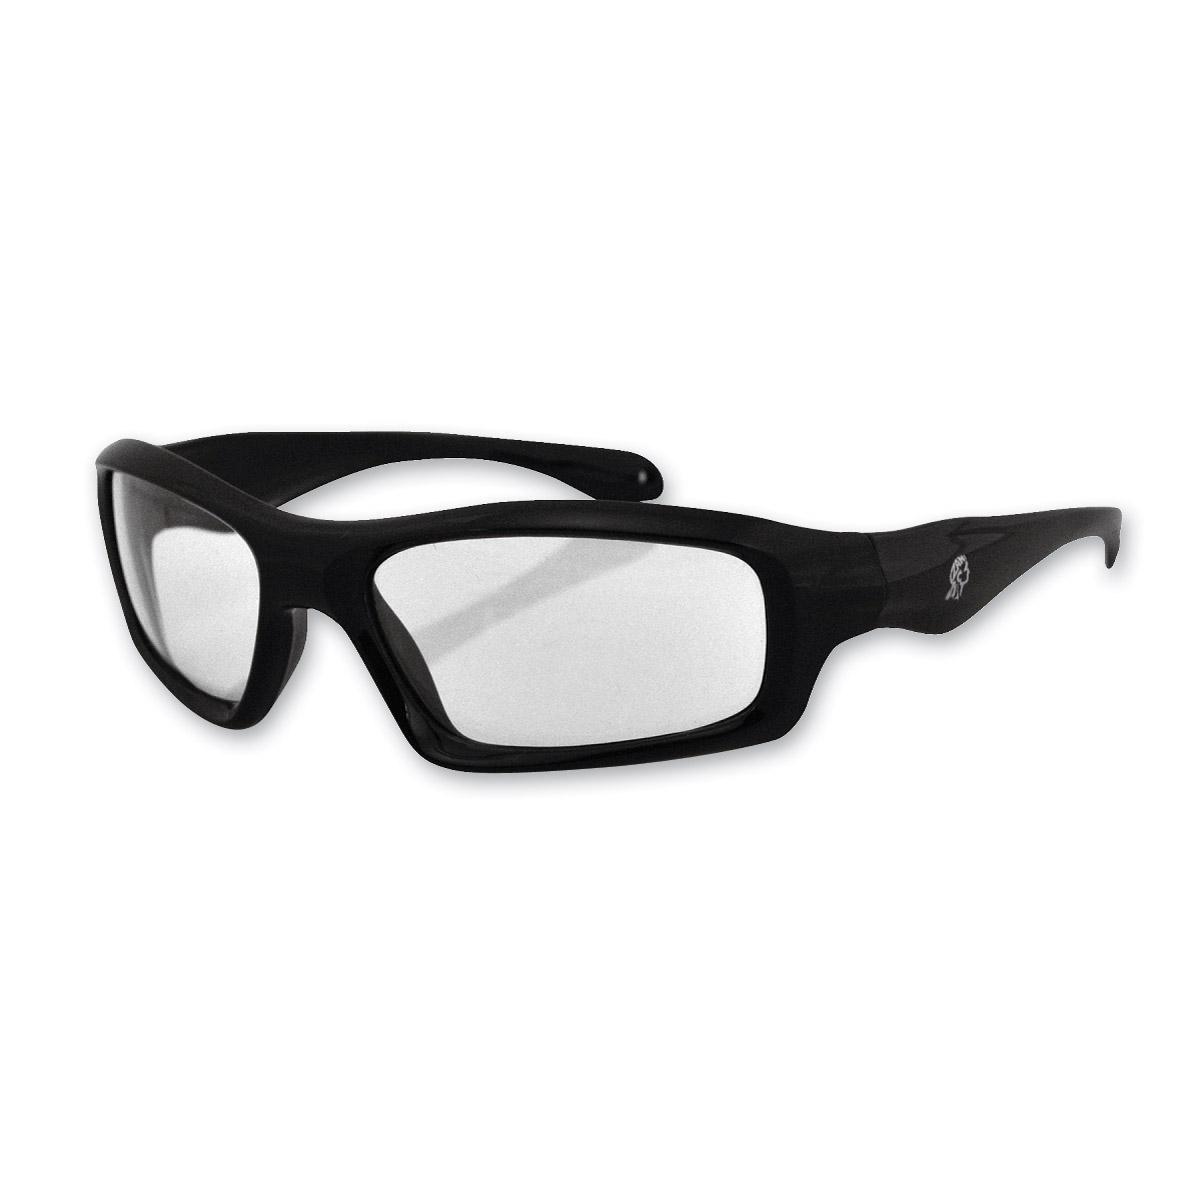 ZAN headgear Seattle Matte Black Sunglasses with Clear Lenses